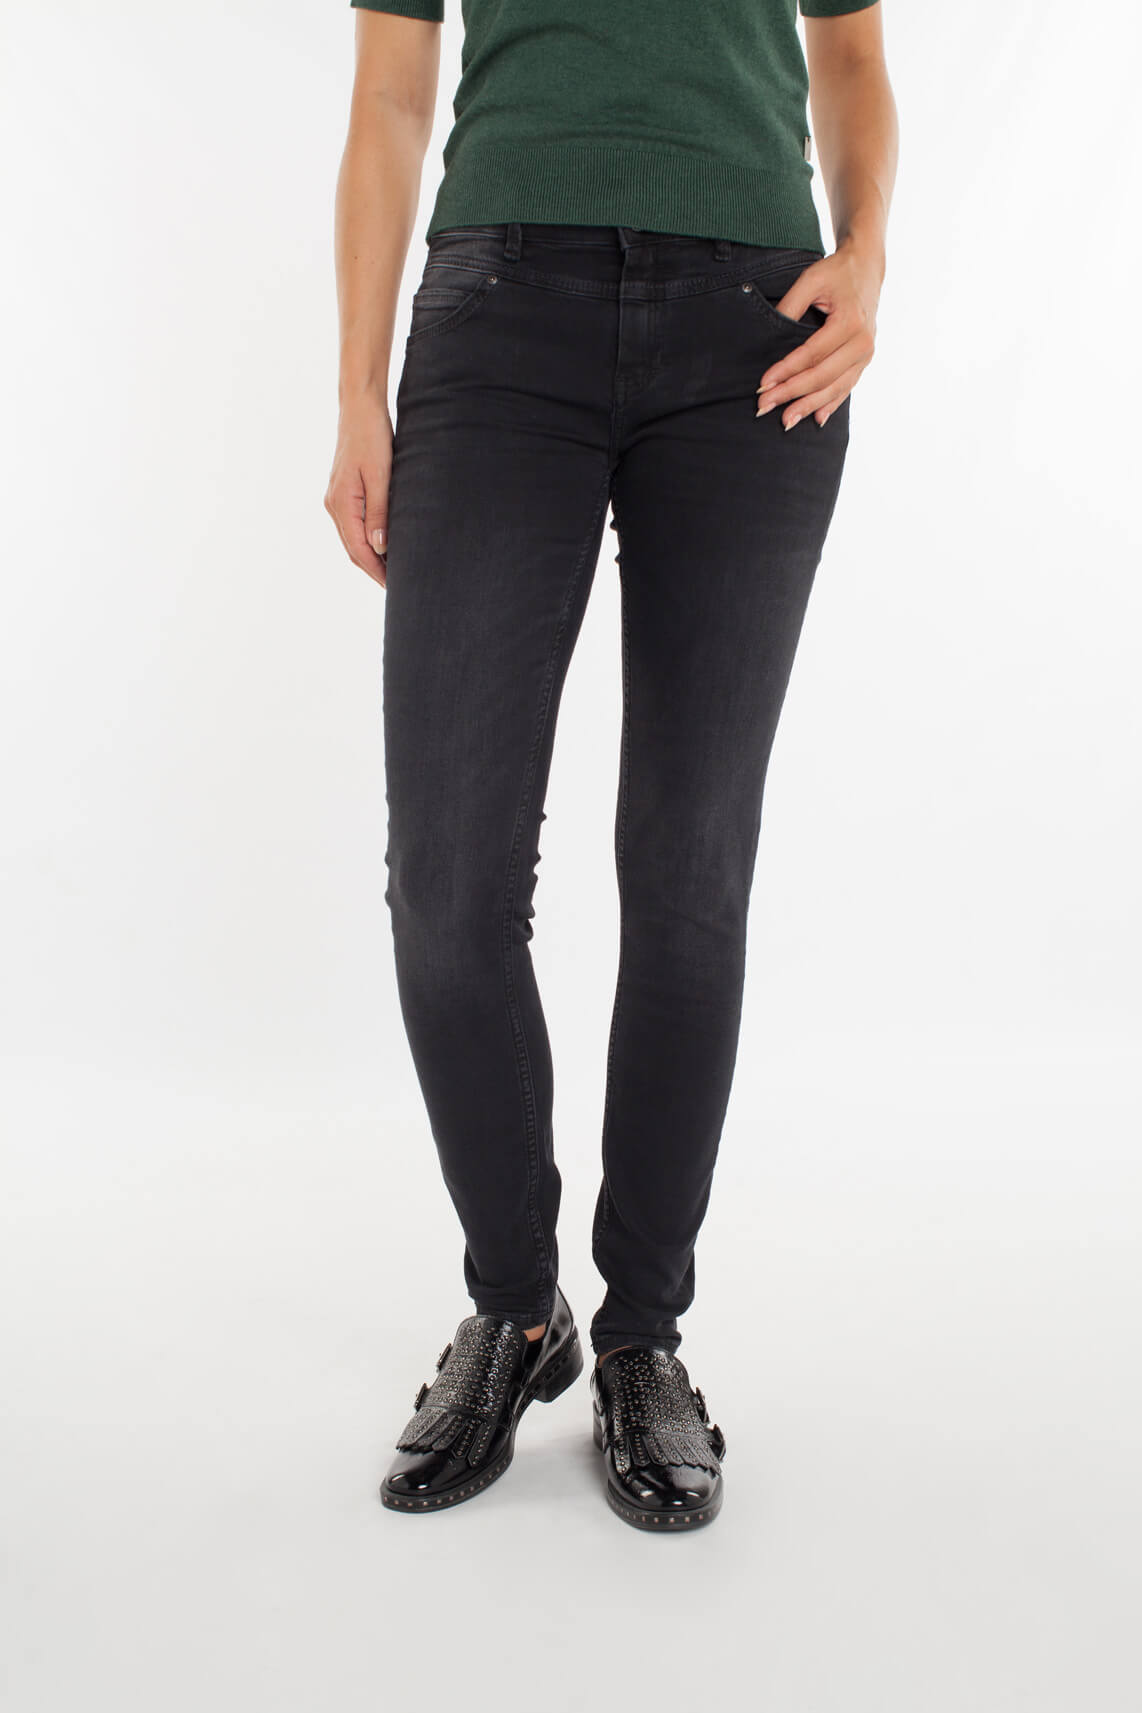 Rosner Dames Antonia skinny jeans zwart